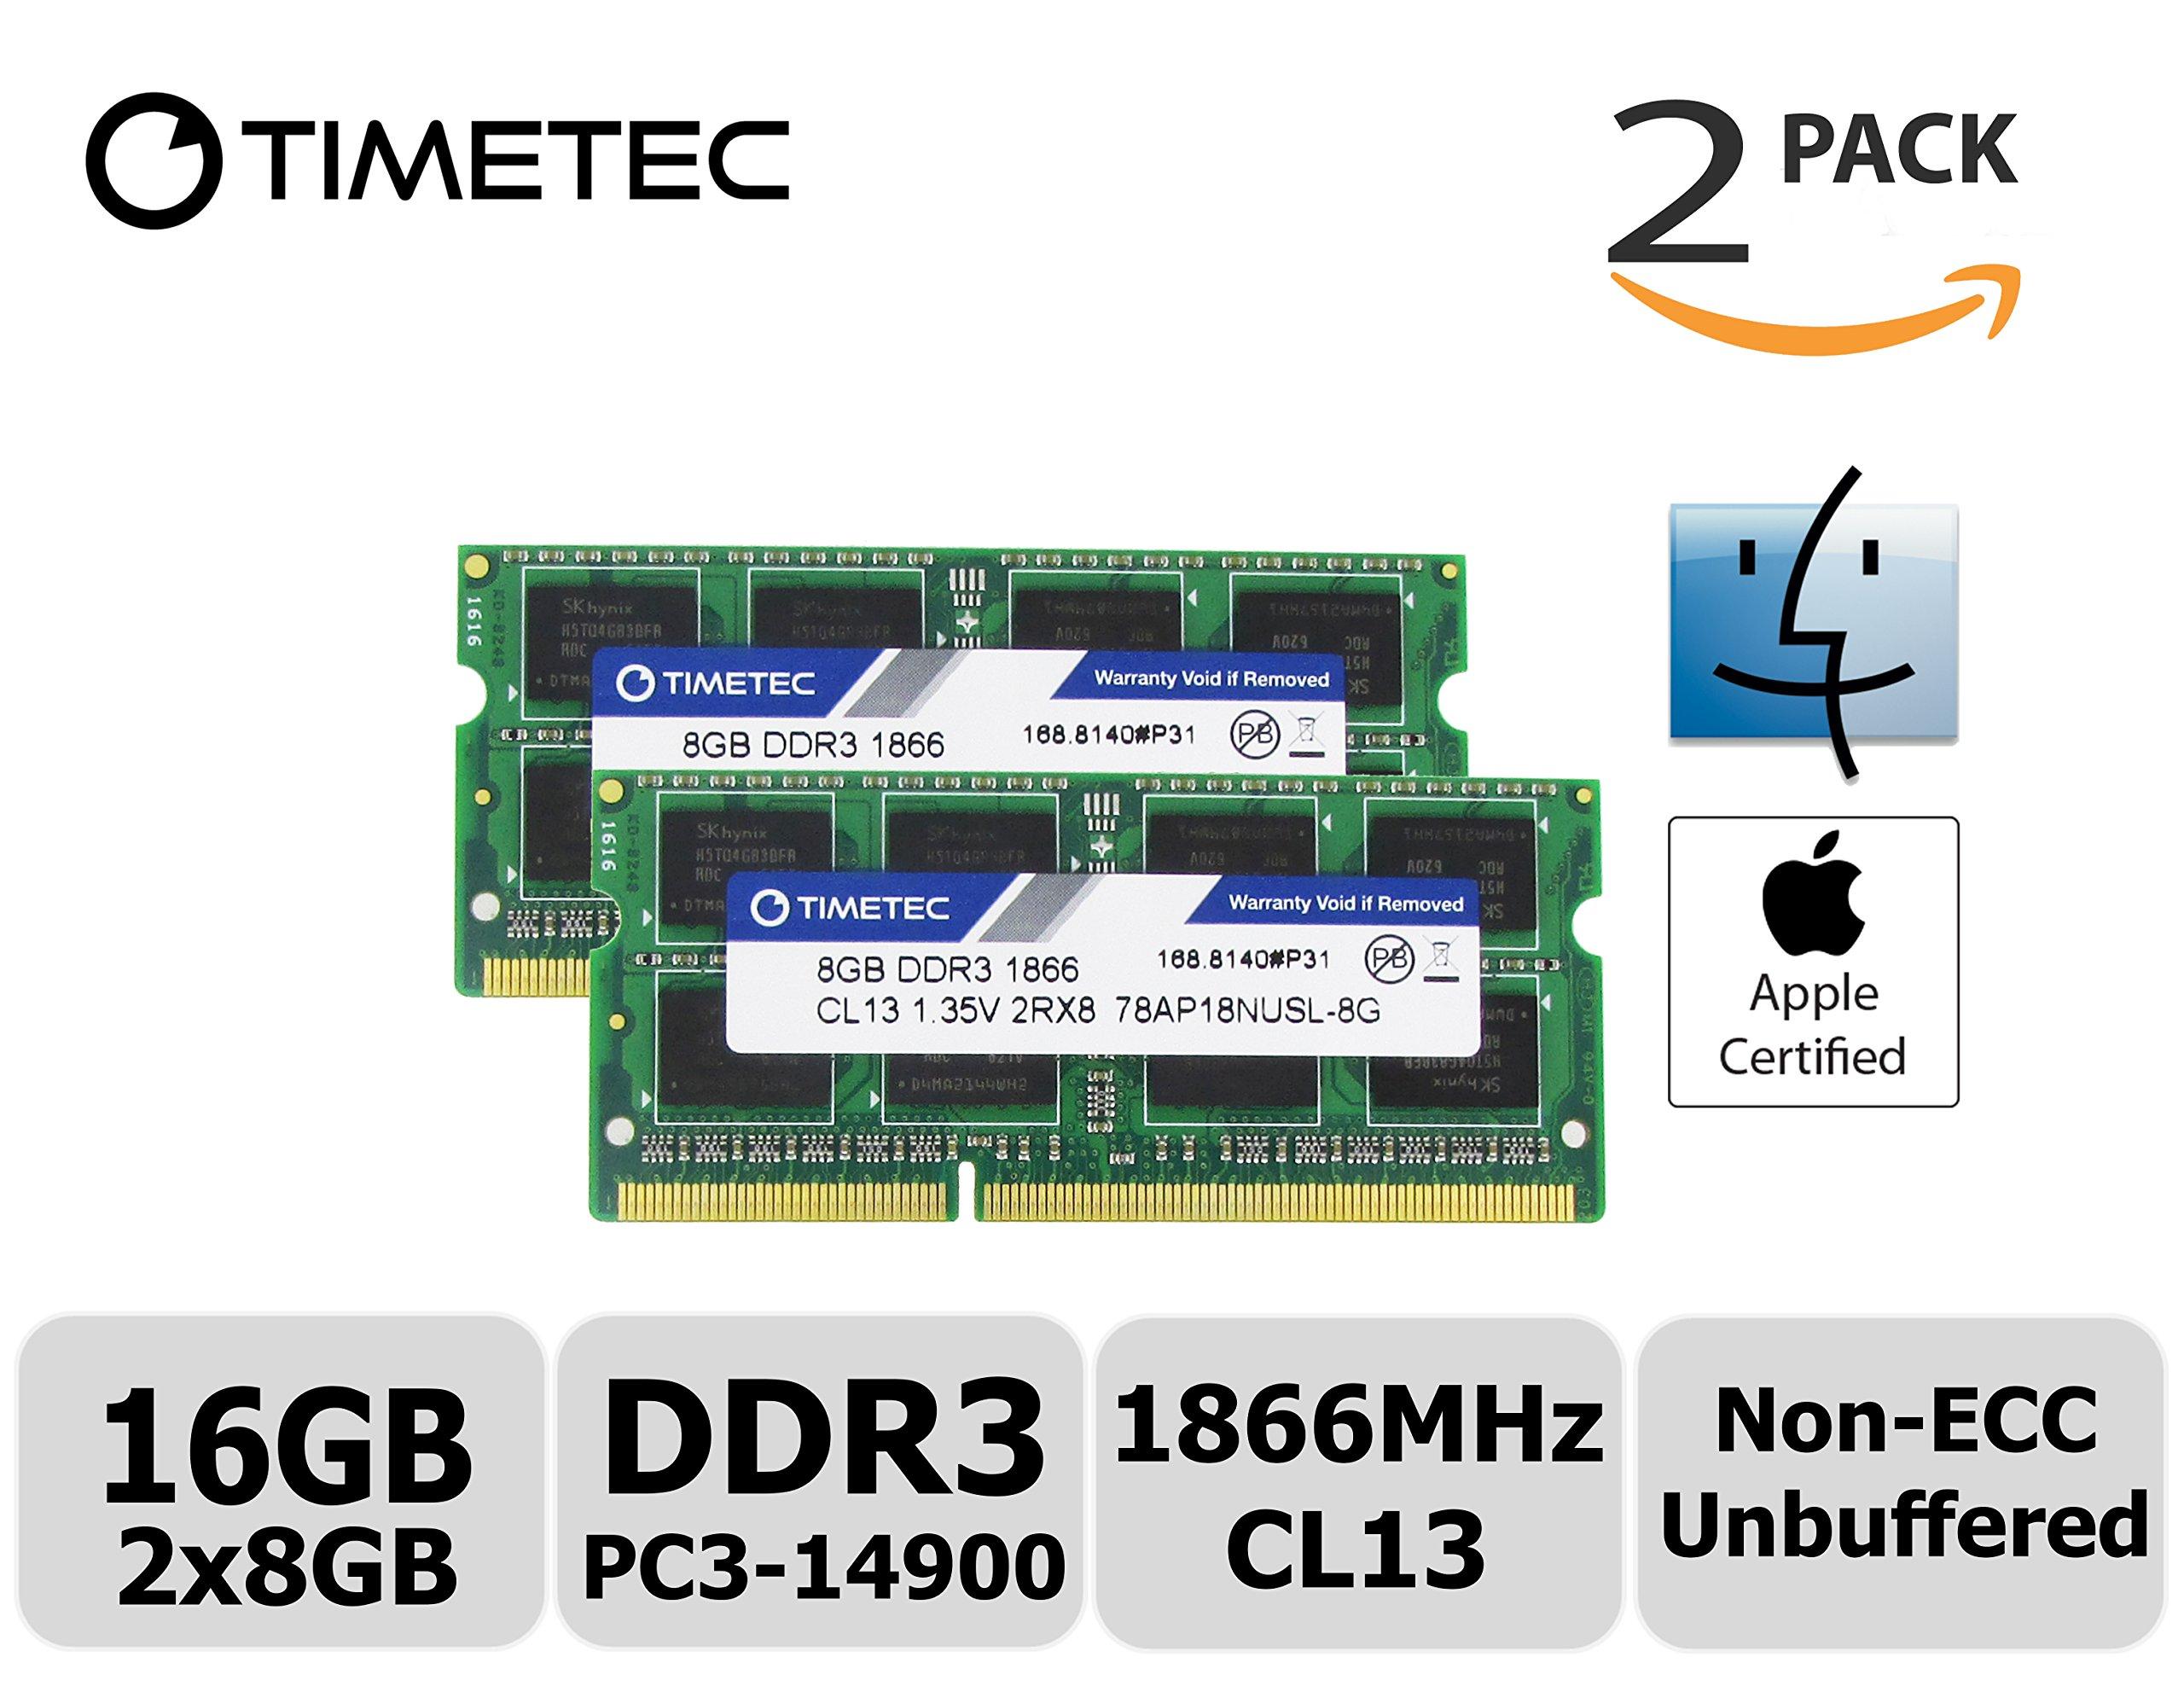 Timetec Hynix IC Apple 16GB Kit (2x8GB) DDR3 PC3-14900 1866MHz for iMac 17,1  w/Retina 5K display (27-inch Late 2015) A1419 (EMC 2834) MK462LL/A, MK472LL/A, MK482LL/A (16GB Kit (2x8GB))